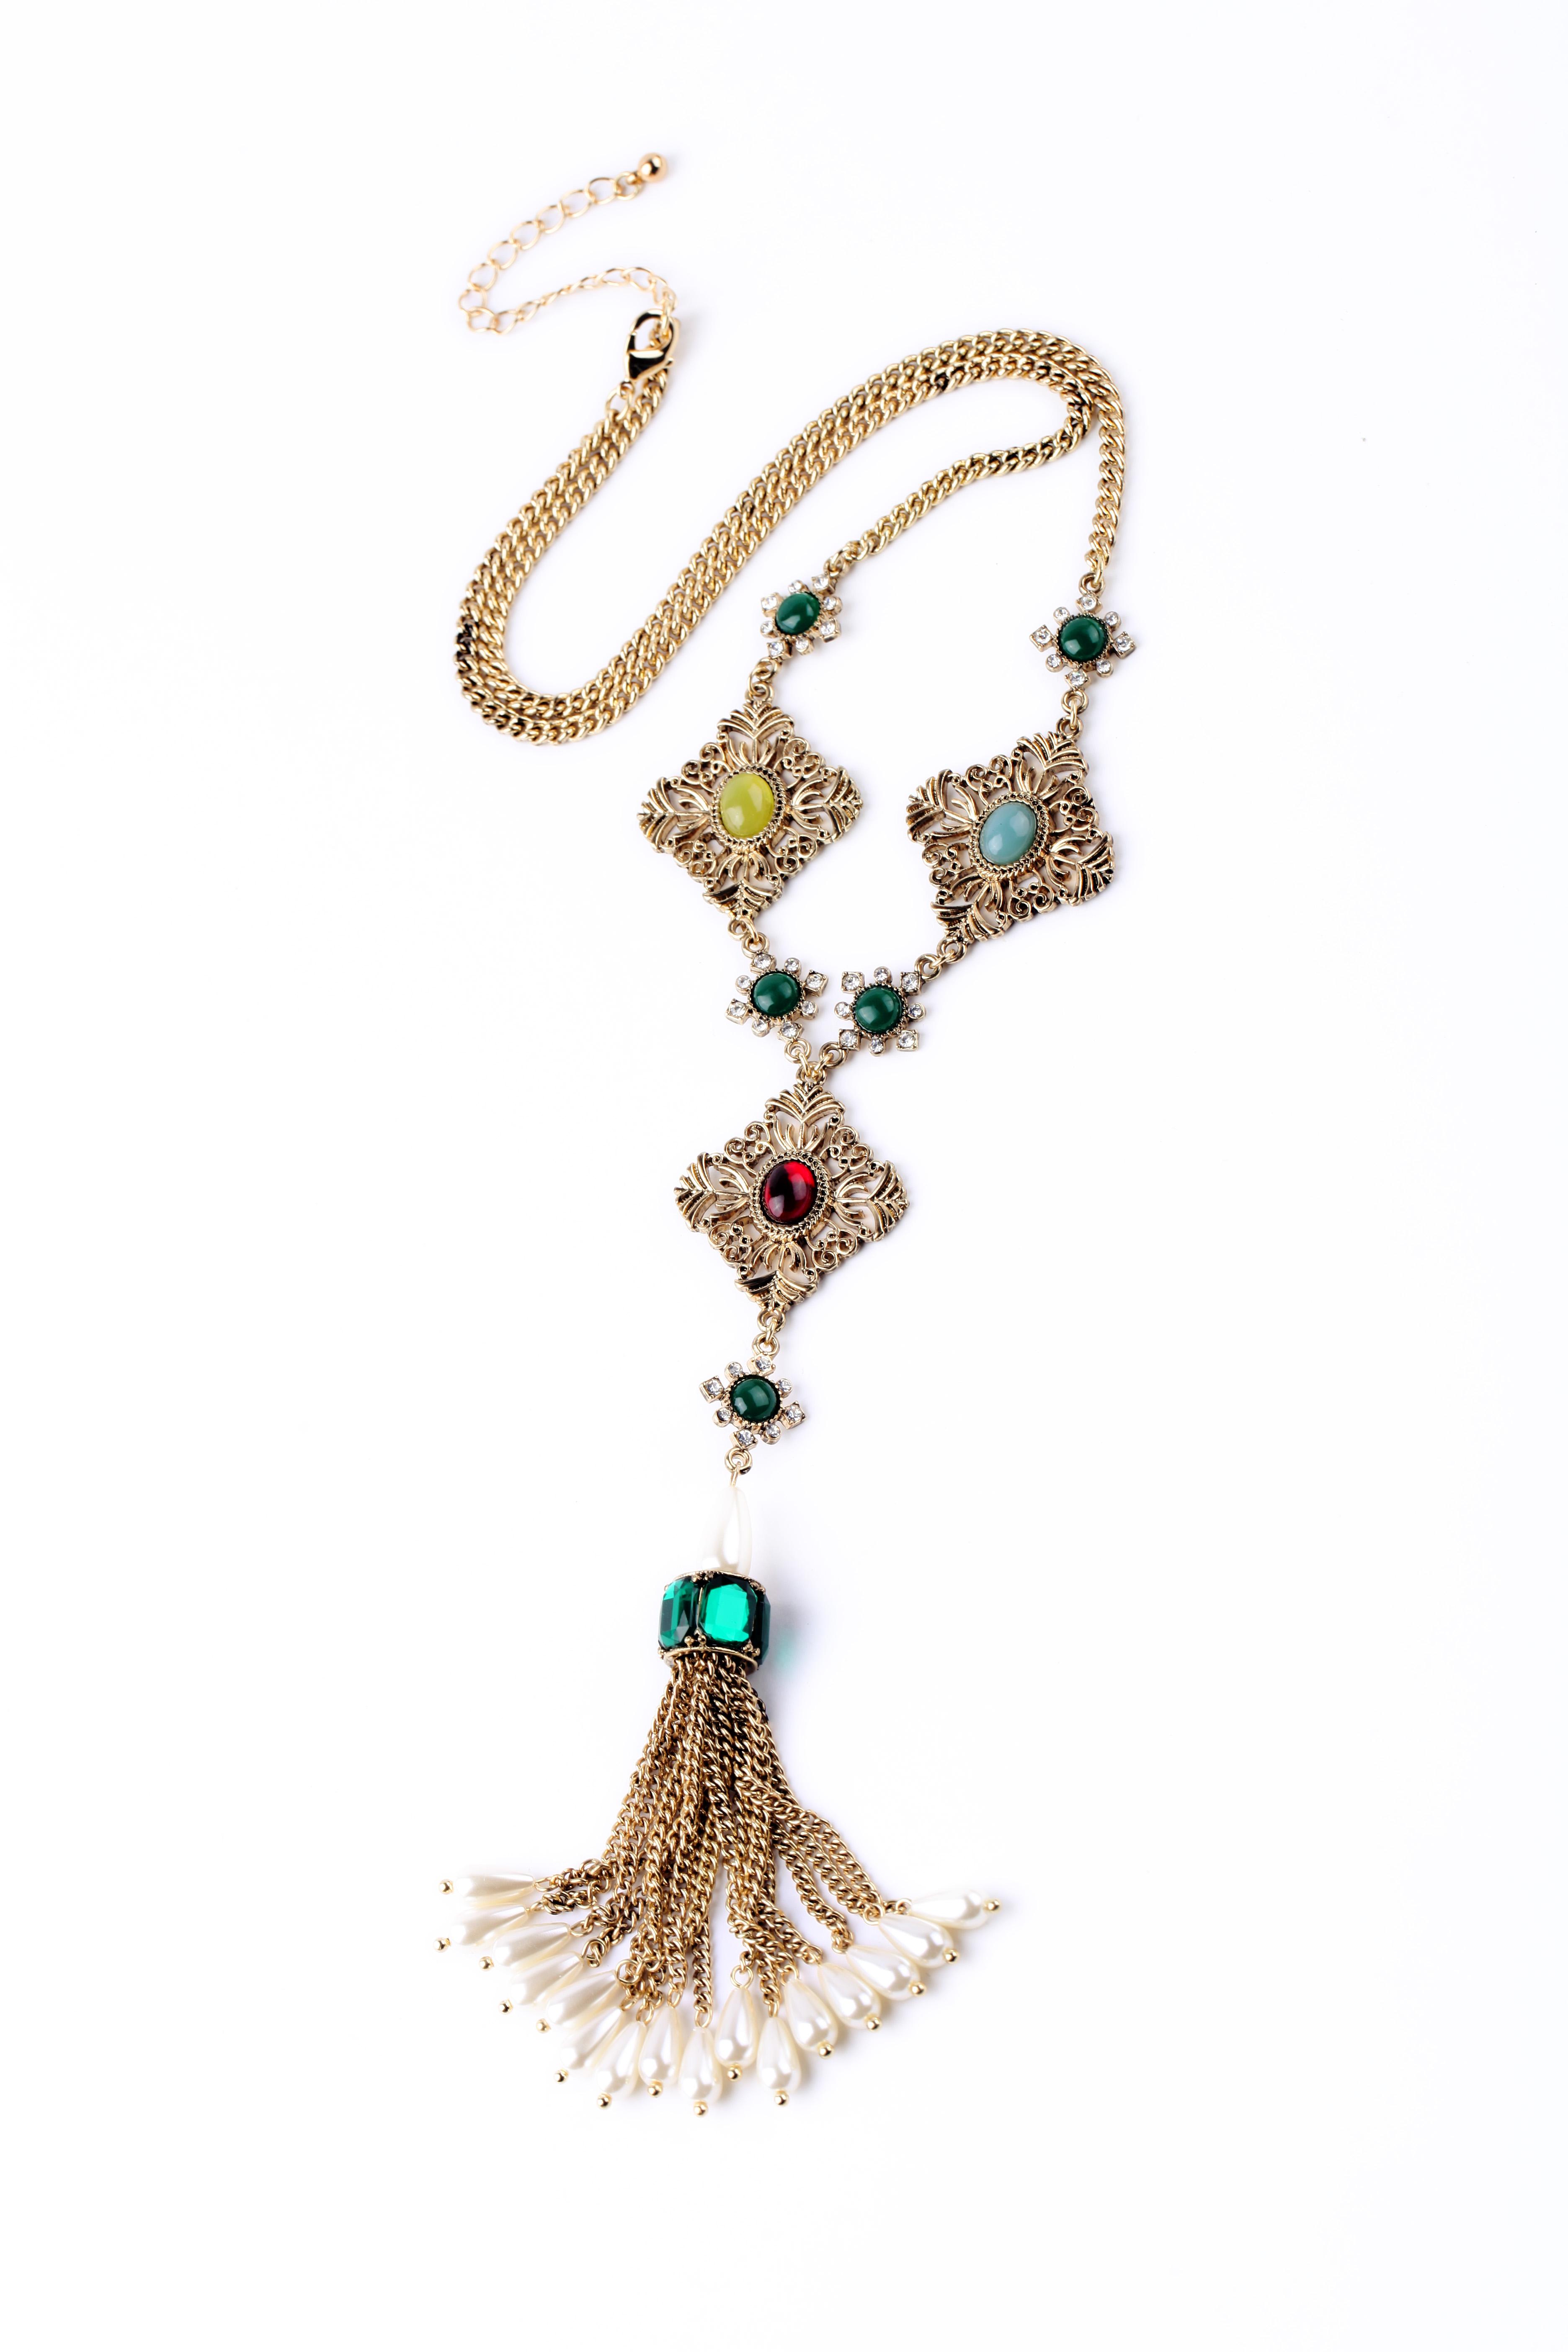 Woman Decoration Colorful Retro Luxury Imitation Pearl Long Tassel Jewelry Necklace Design Inspiration International Brand 2015(China (Mainland))